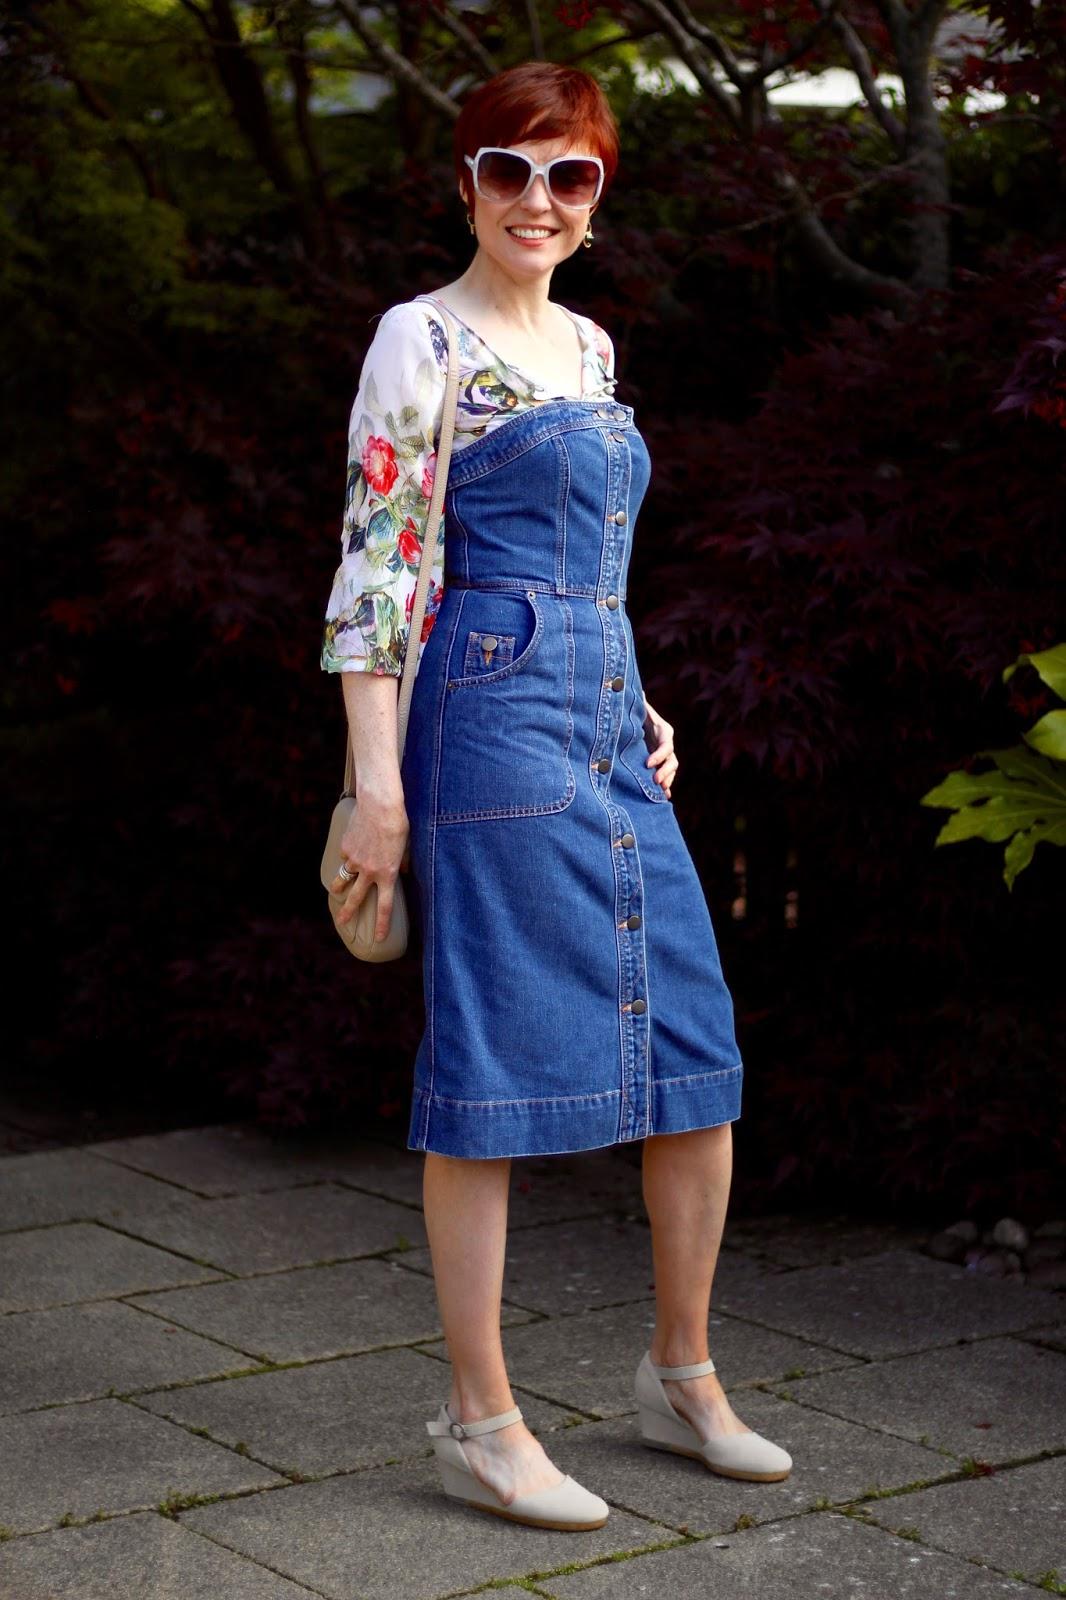 Whistles Denim Bustier Dress, Chiffon Floral Blouse, Clarks Original Wedges | Fake Fabulous